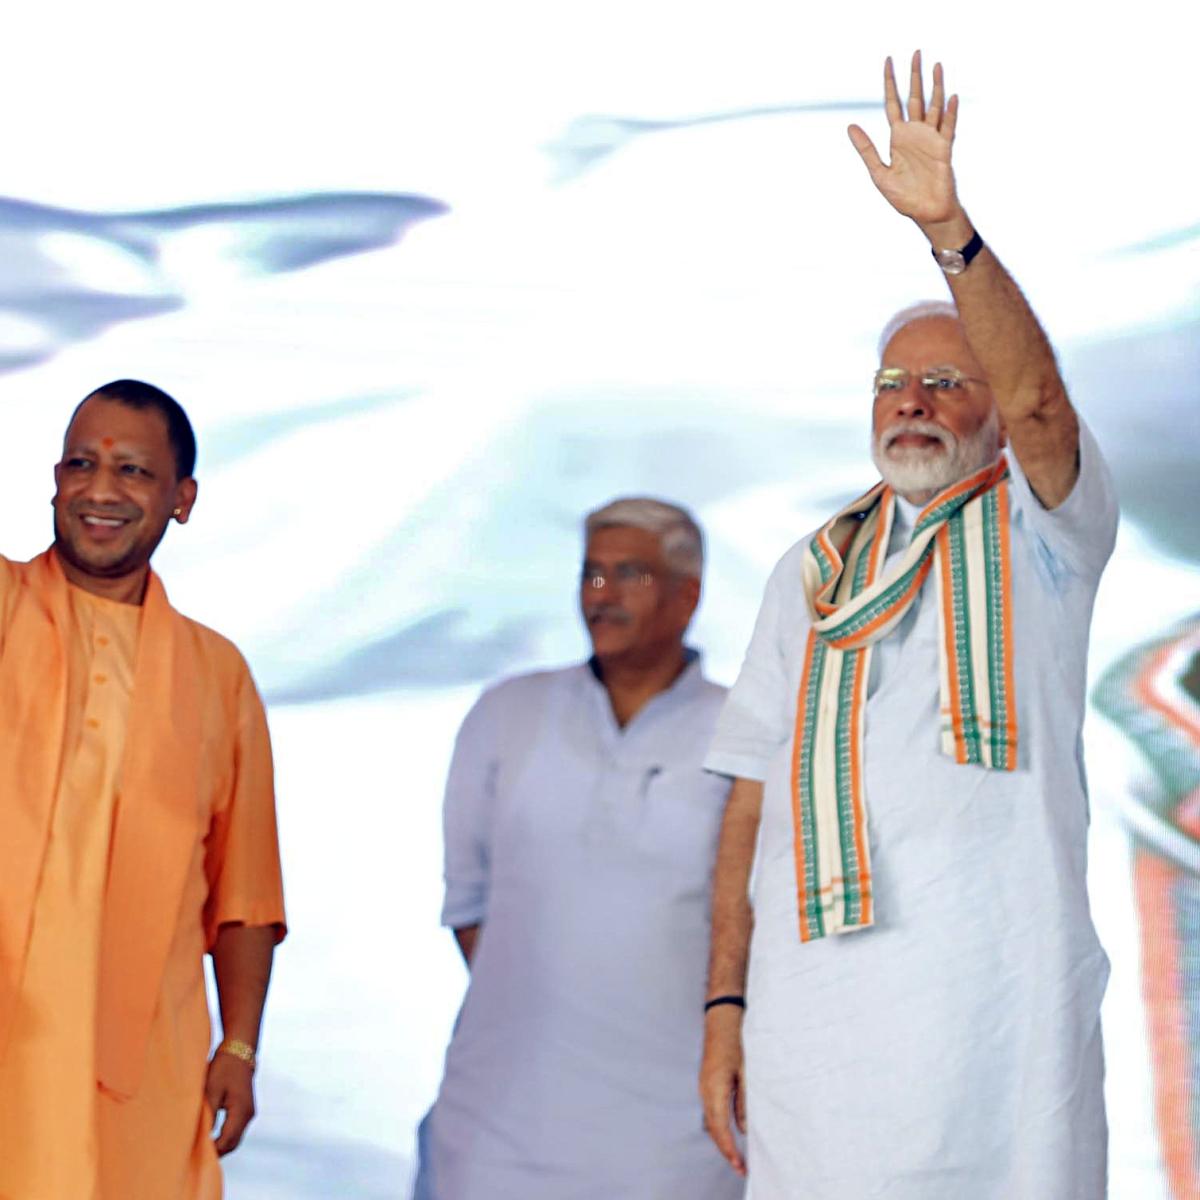 PM Modi praises Yogi Adityanath for efforts to combat encephalitis